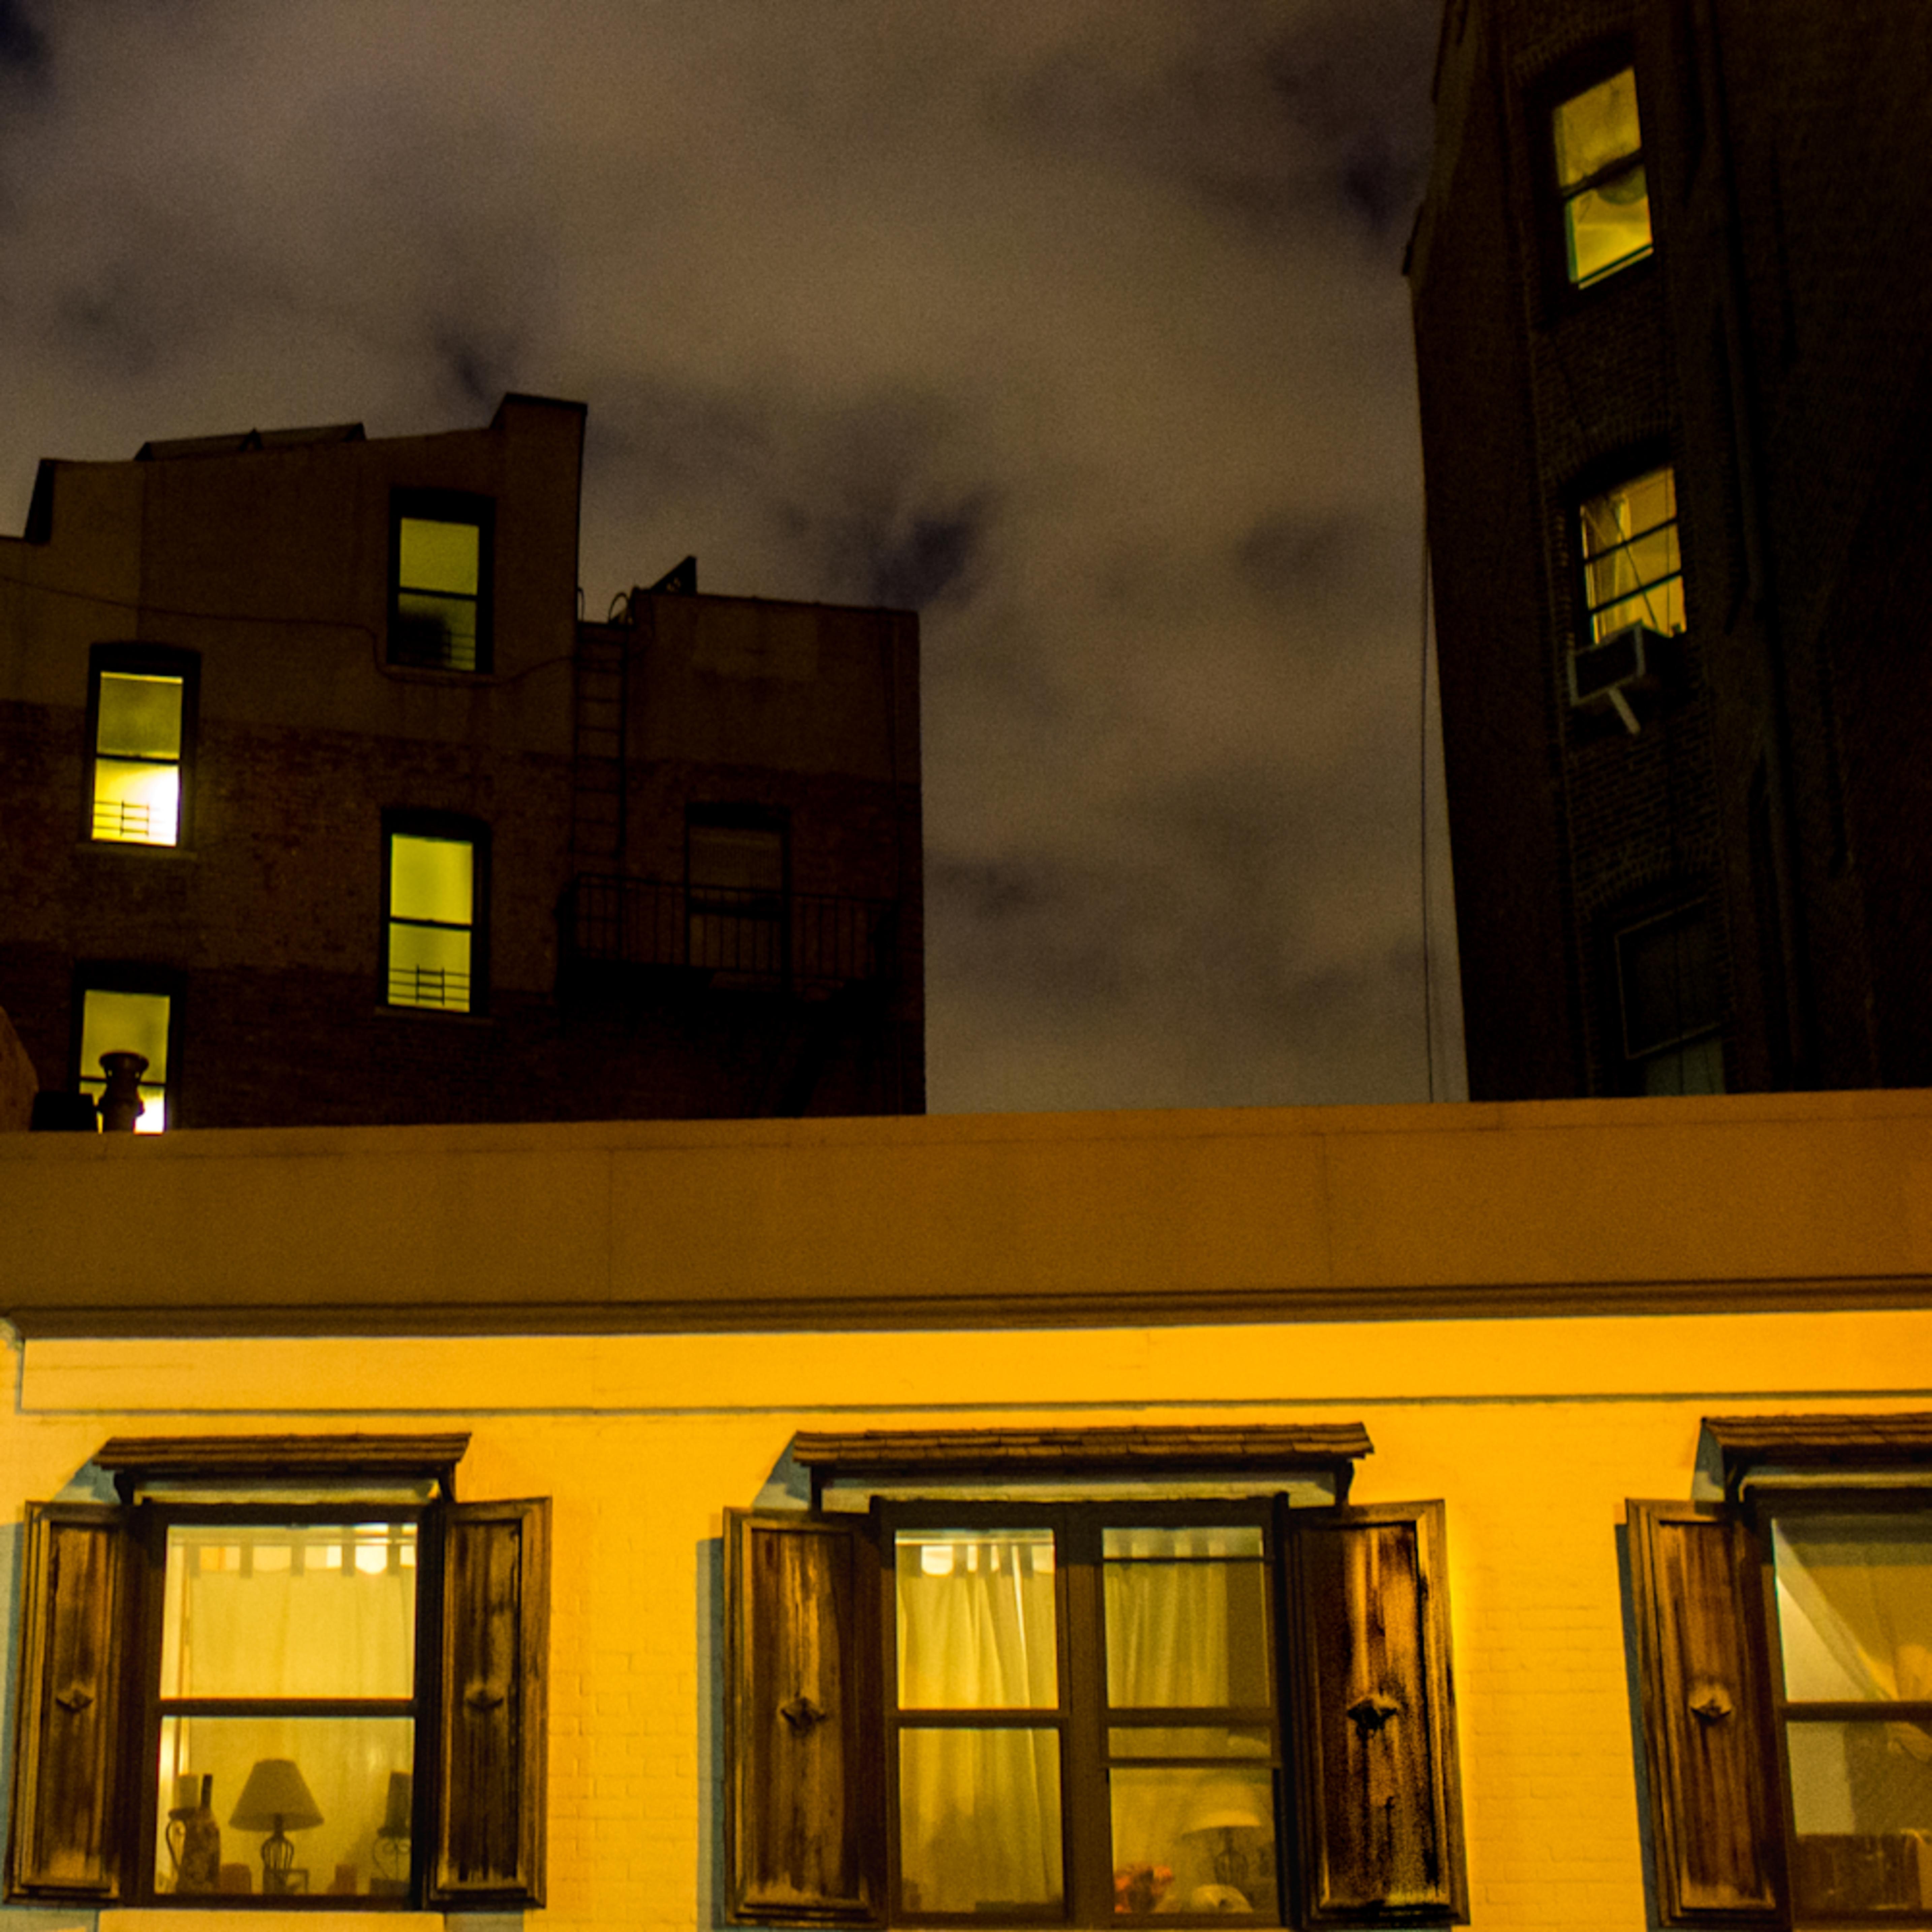 Night on east ninth street nyc asen0060 t4avgh